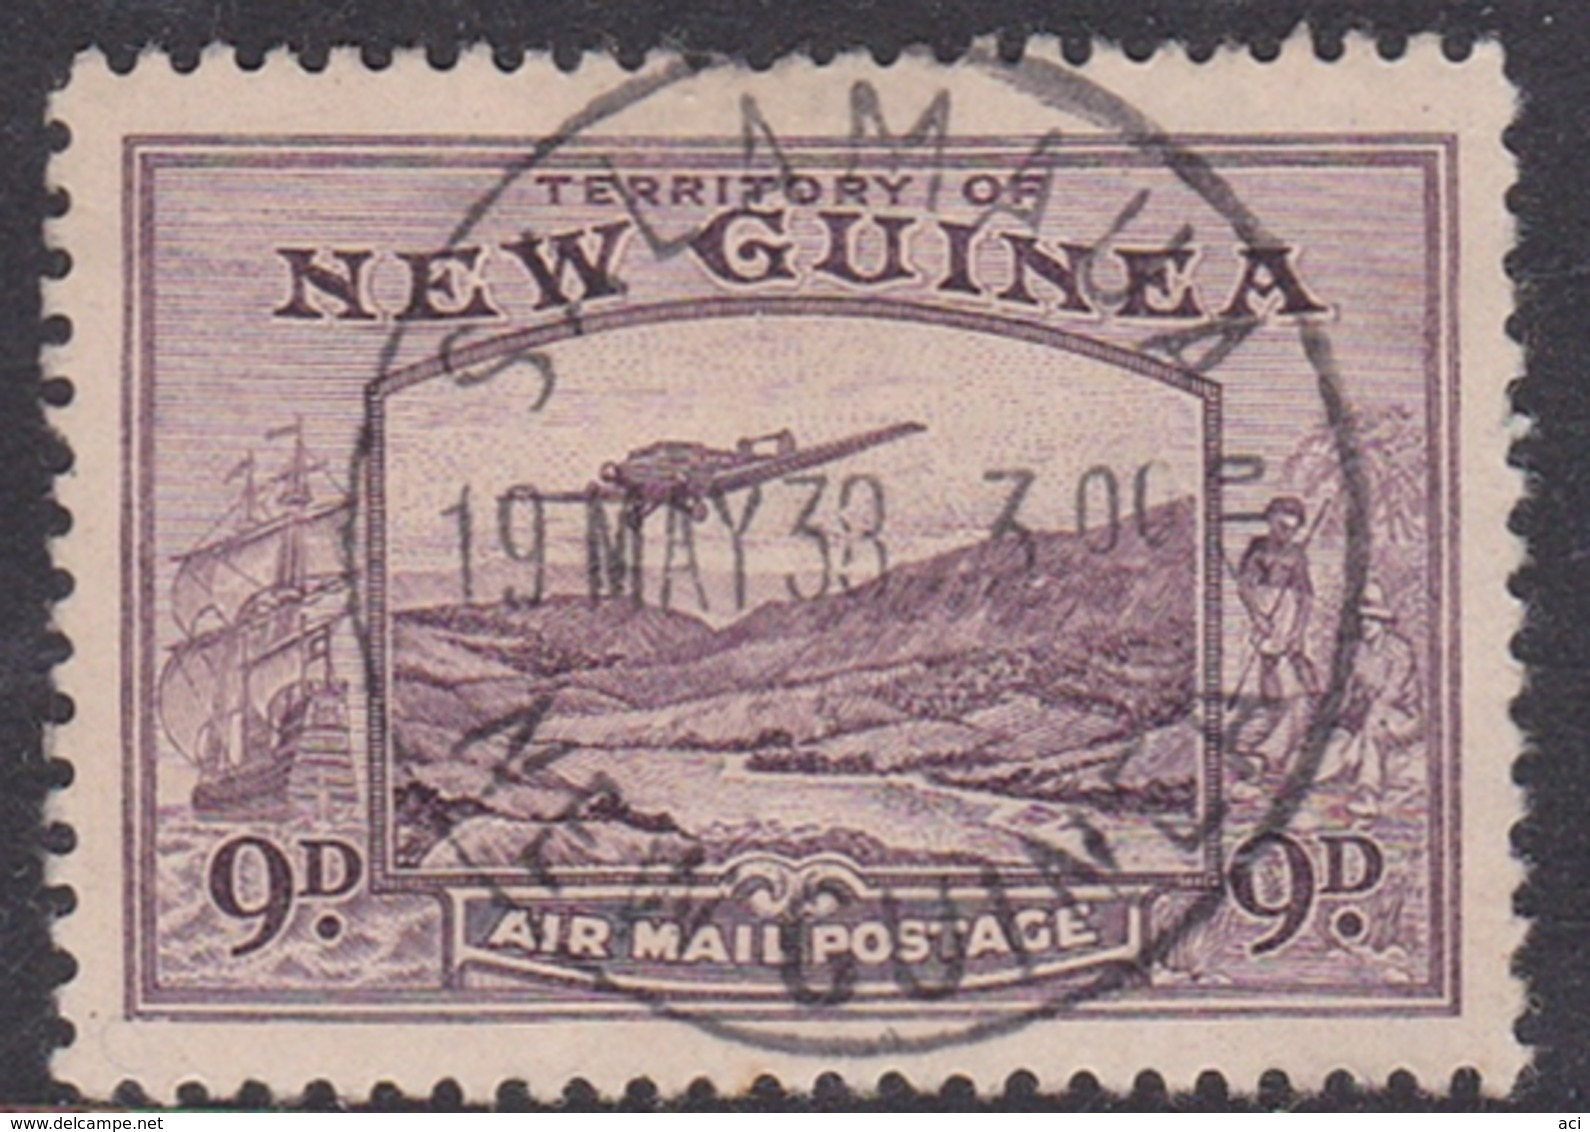 New Guinea Scott C54 1939 Air Plane, 9p Violet, Used - Papua New Guinea